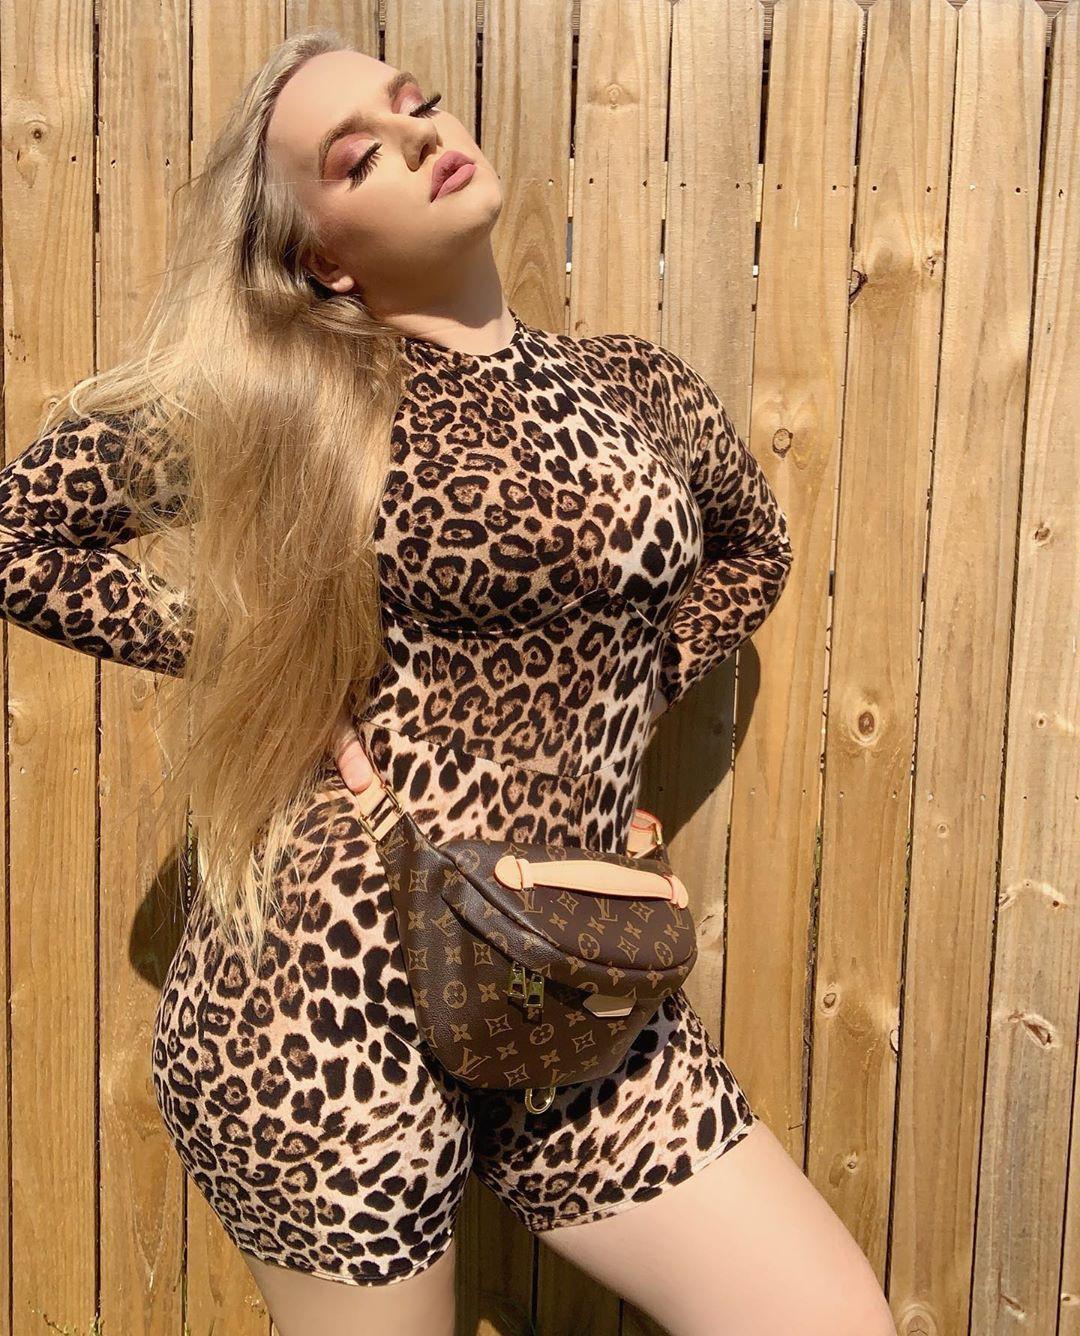 Angelica Maria fur colour ideas, girls photoshoot, legs photo